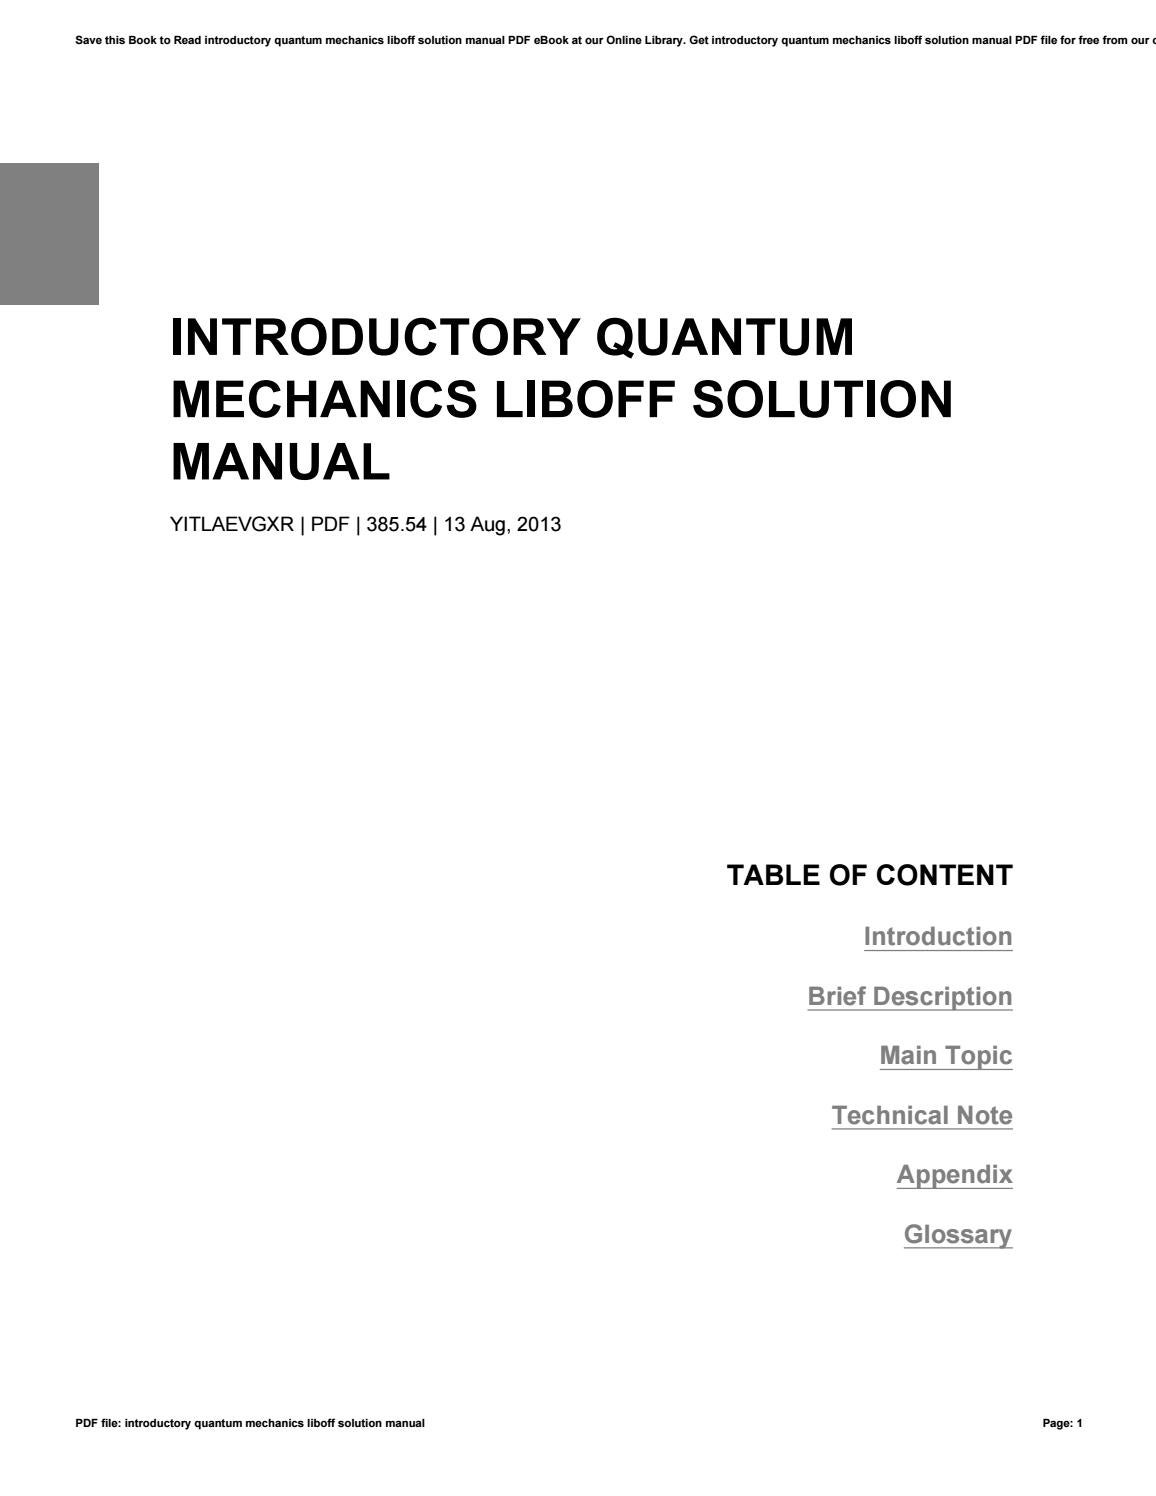 Solution-manual-liboff. Pdf pdf free download.